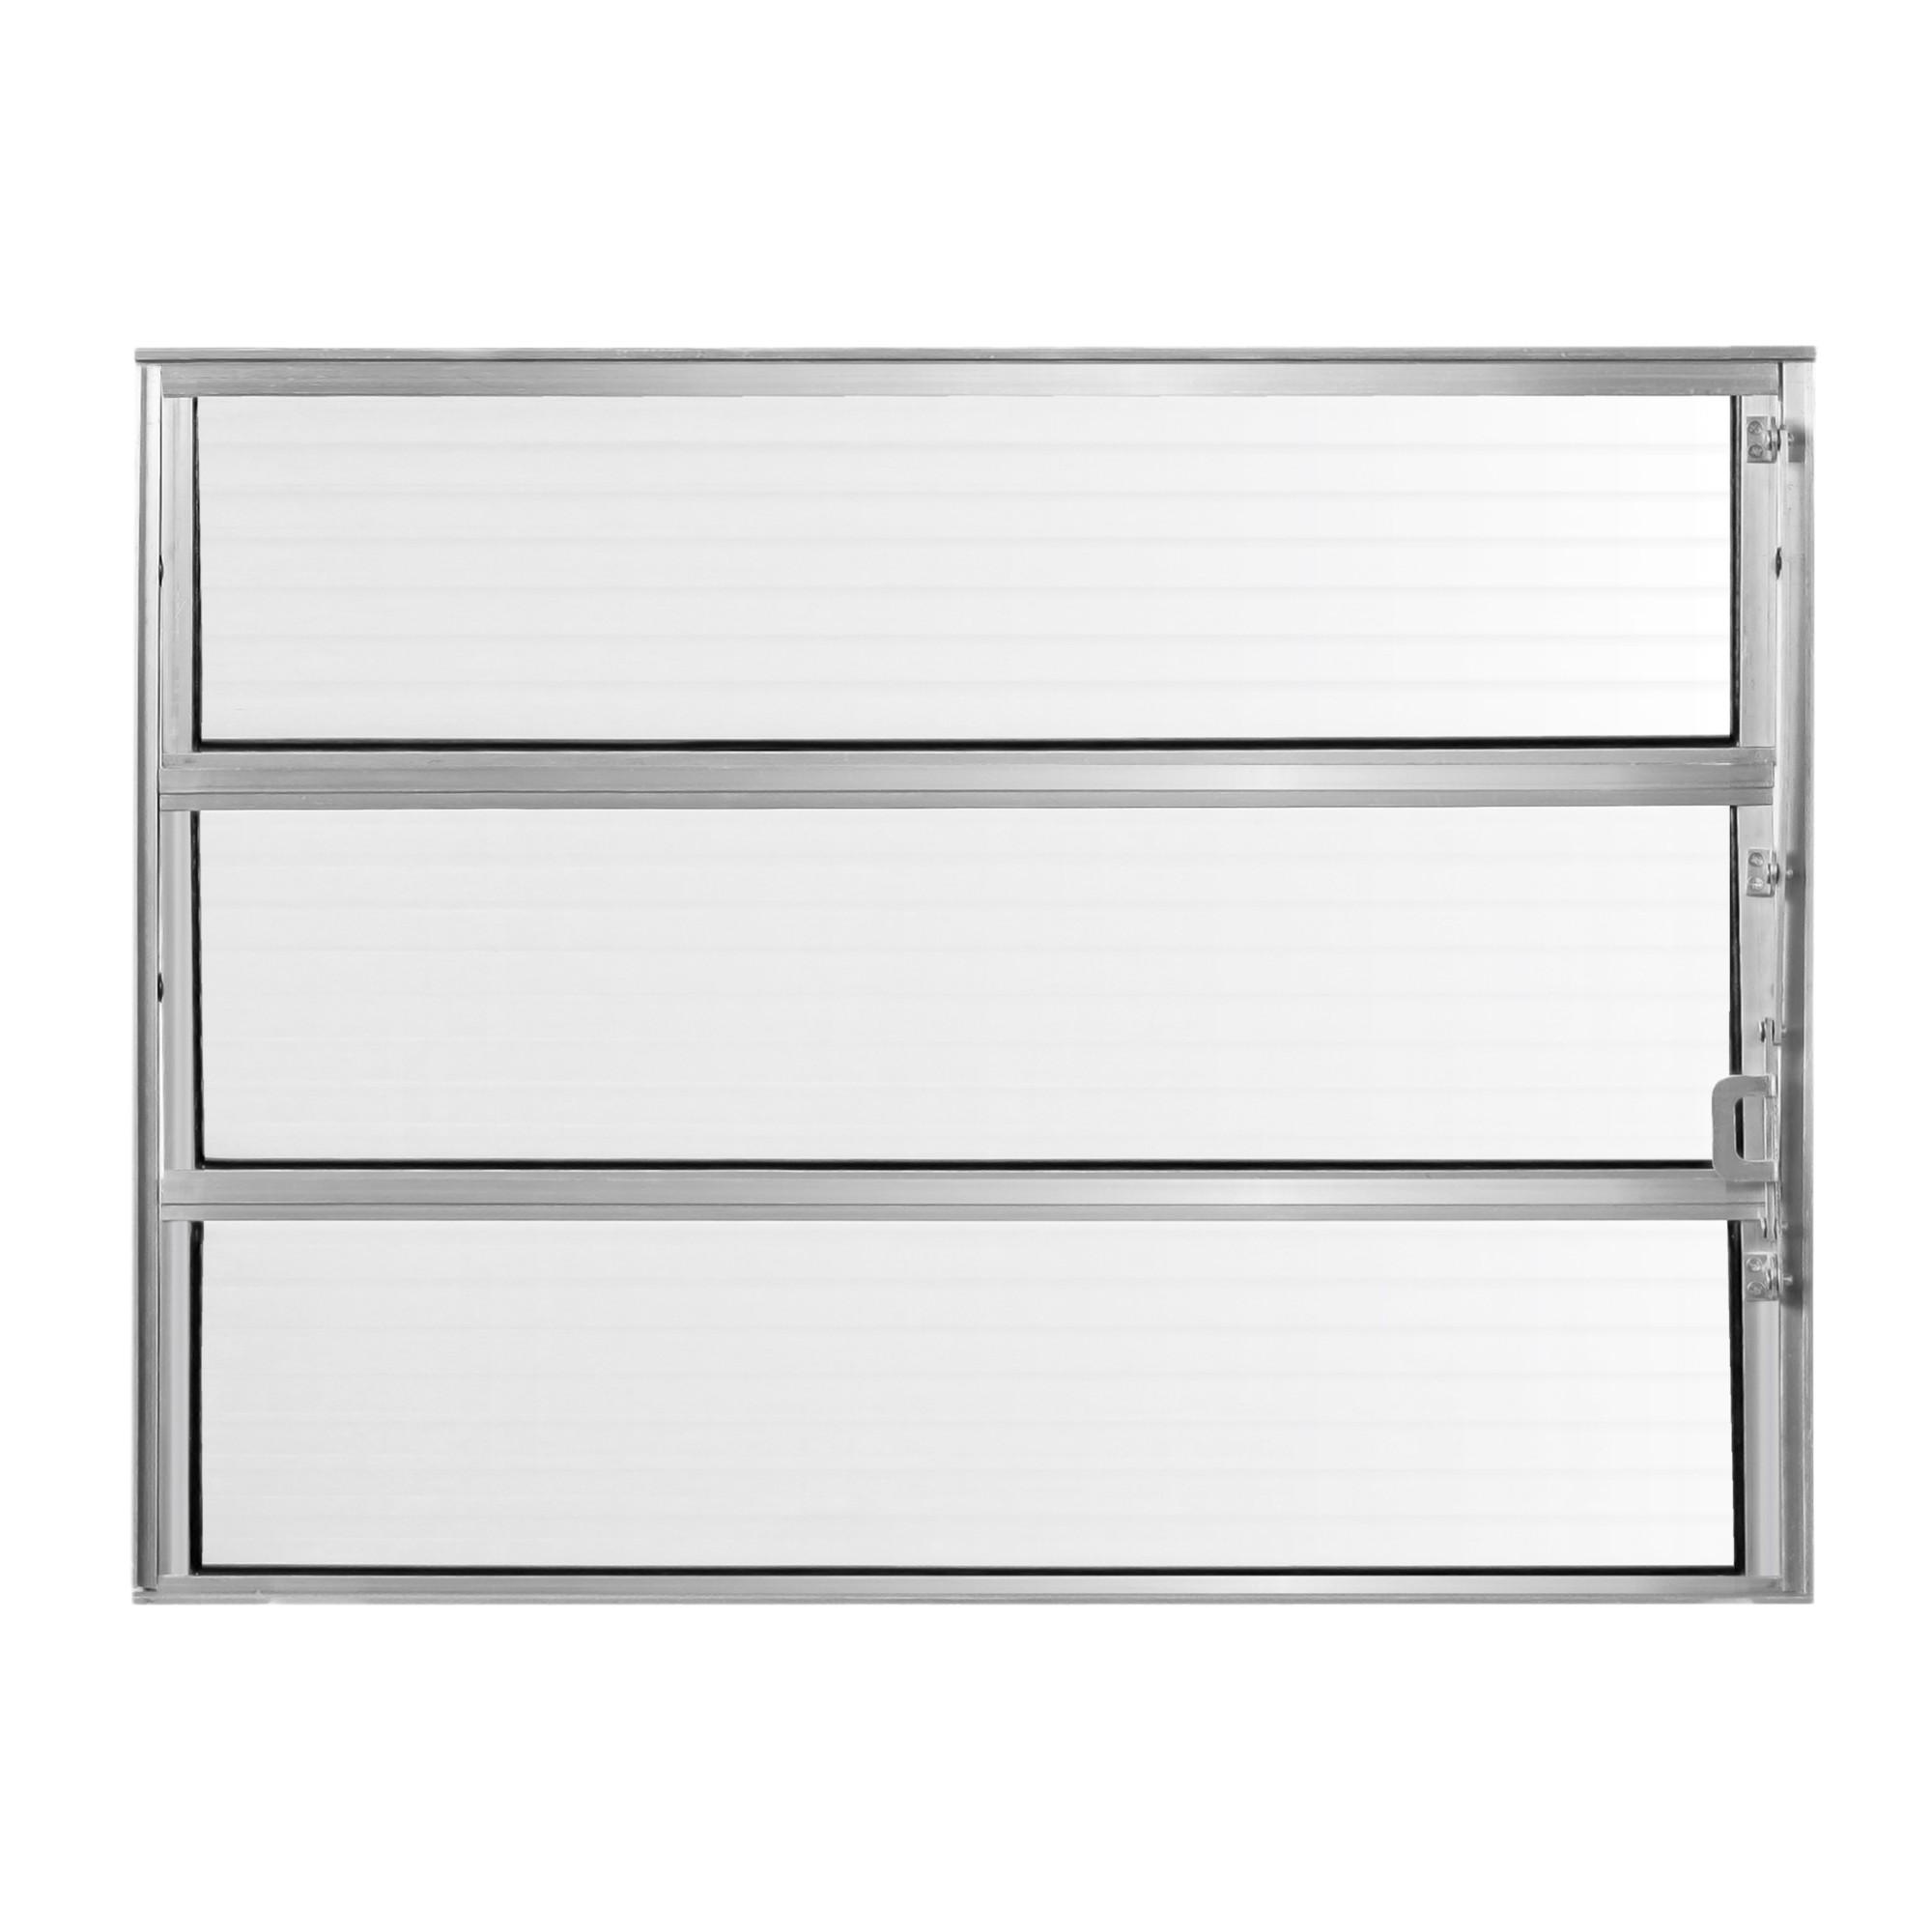 Janela de Abrir Basculante de Aluminio Vidro Canelado 100x100 cm Cinza - Aluvid